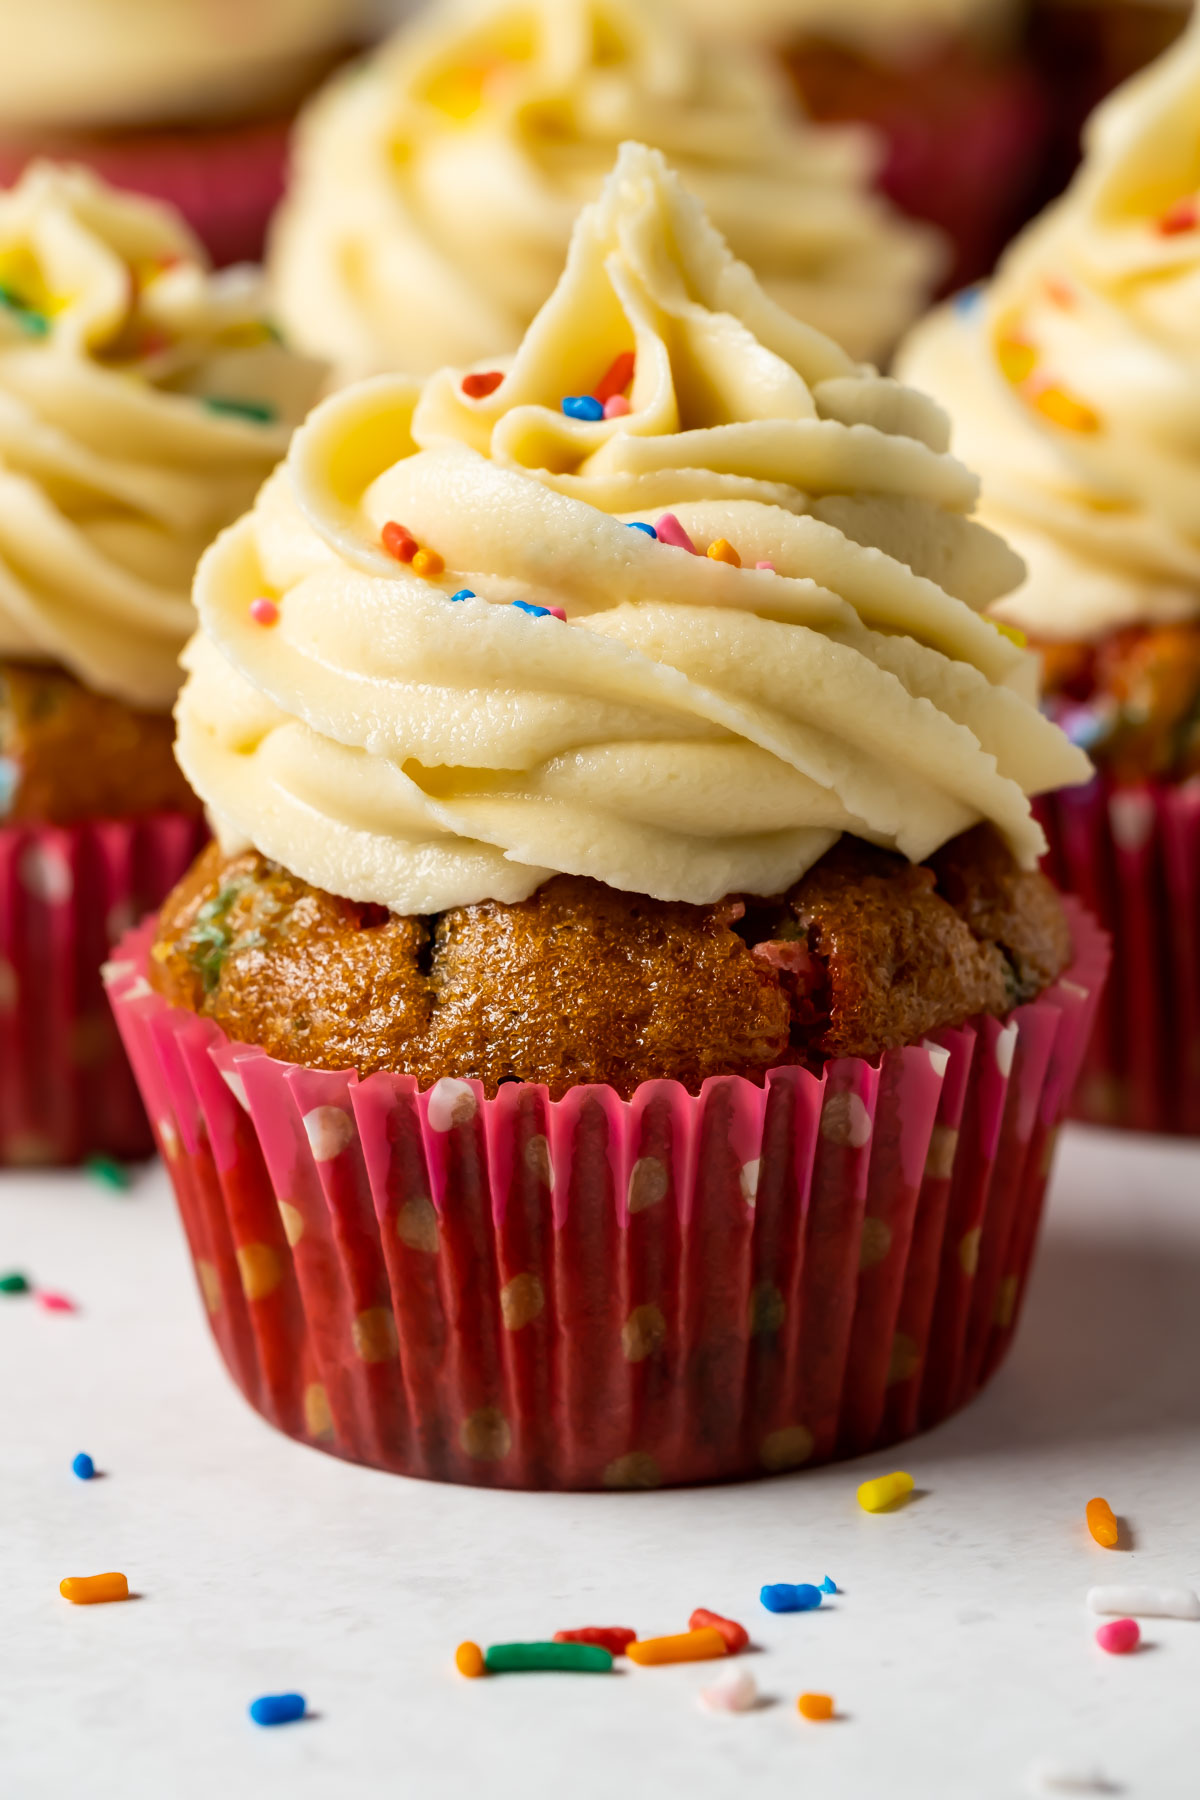 Vegan funfetti cupcakes on a white plate.